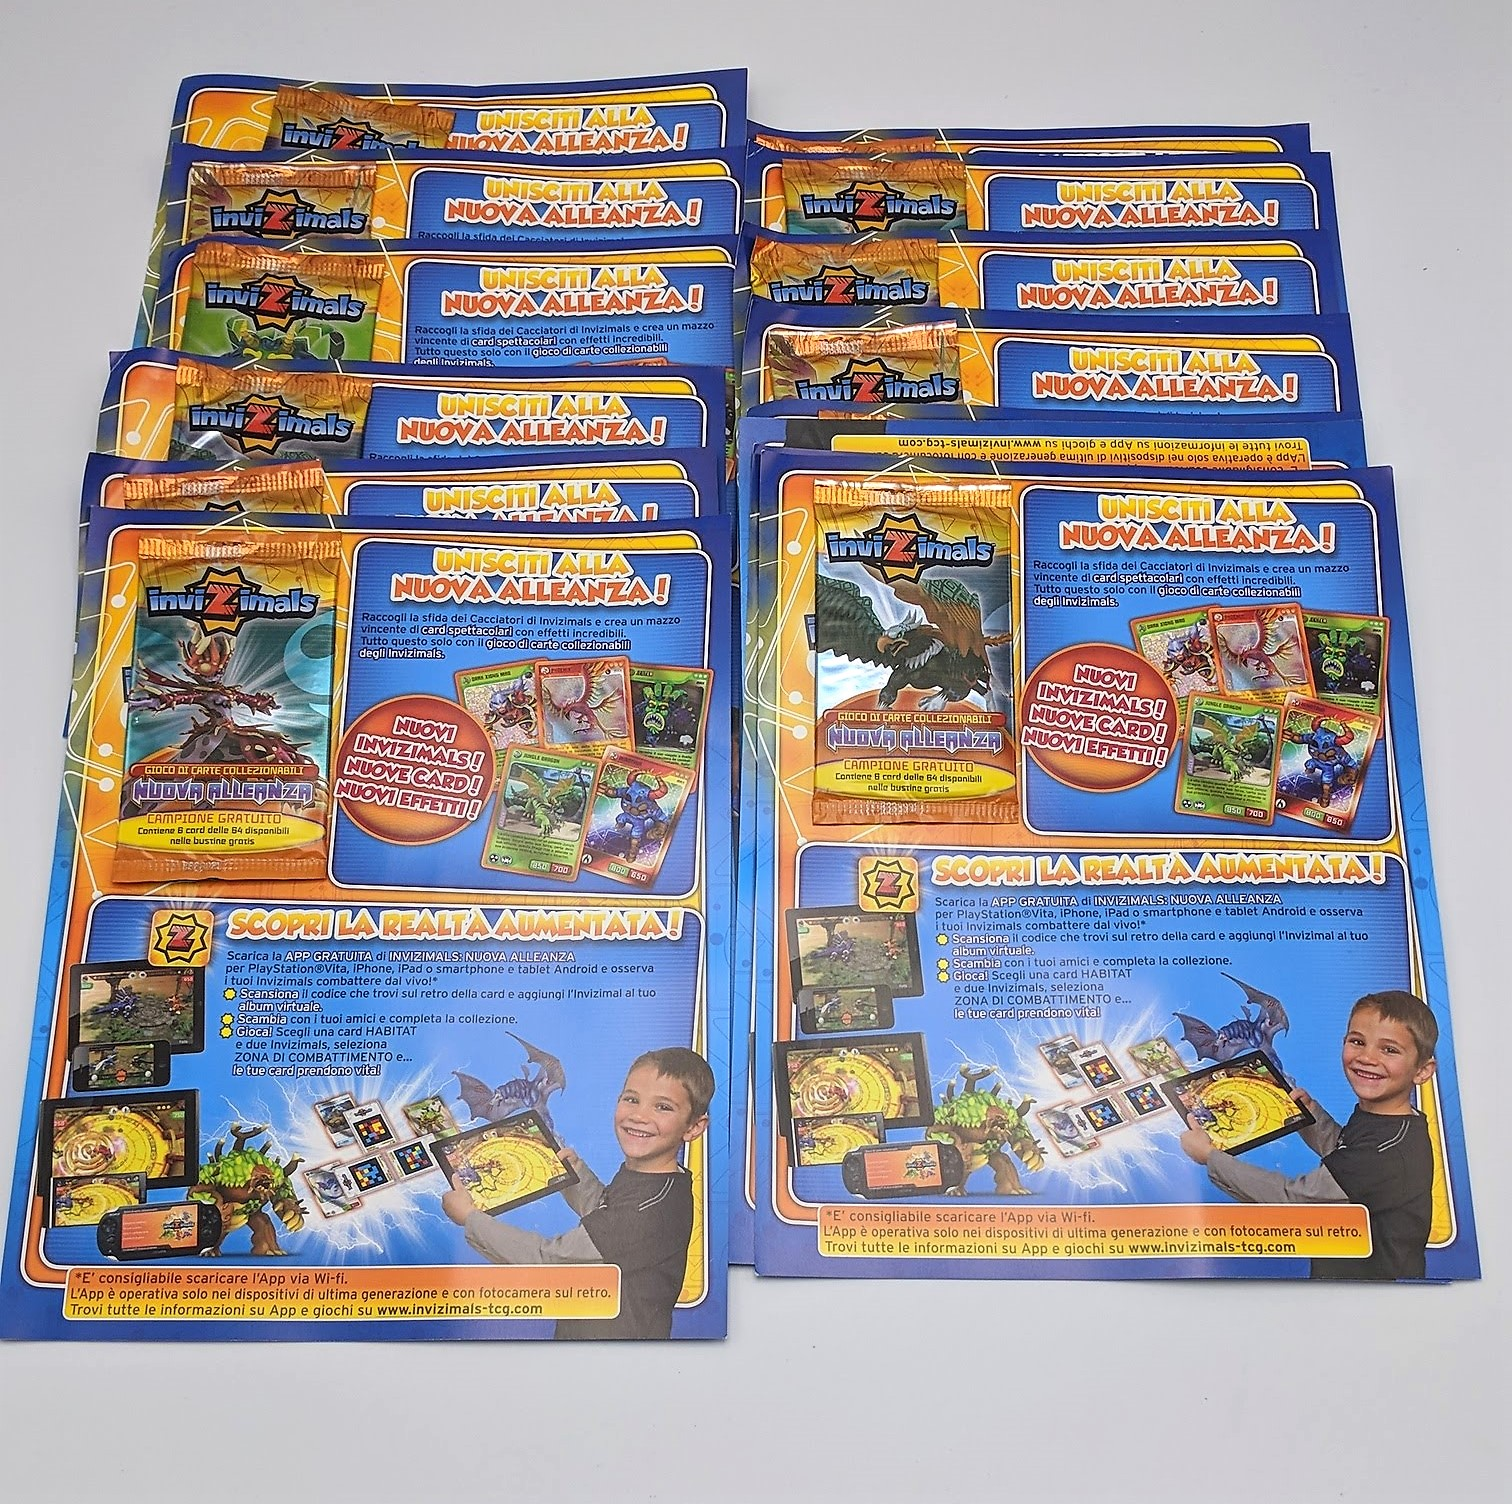 AVENGERS INFINITY WAR PANINI ALBUM 50 bustine V.OMAGGIO figurine packets